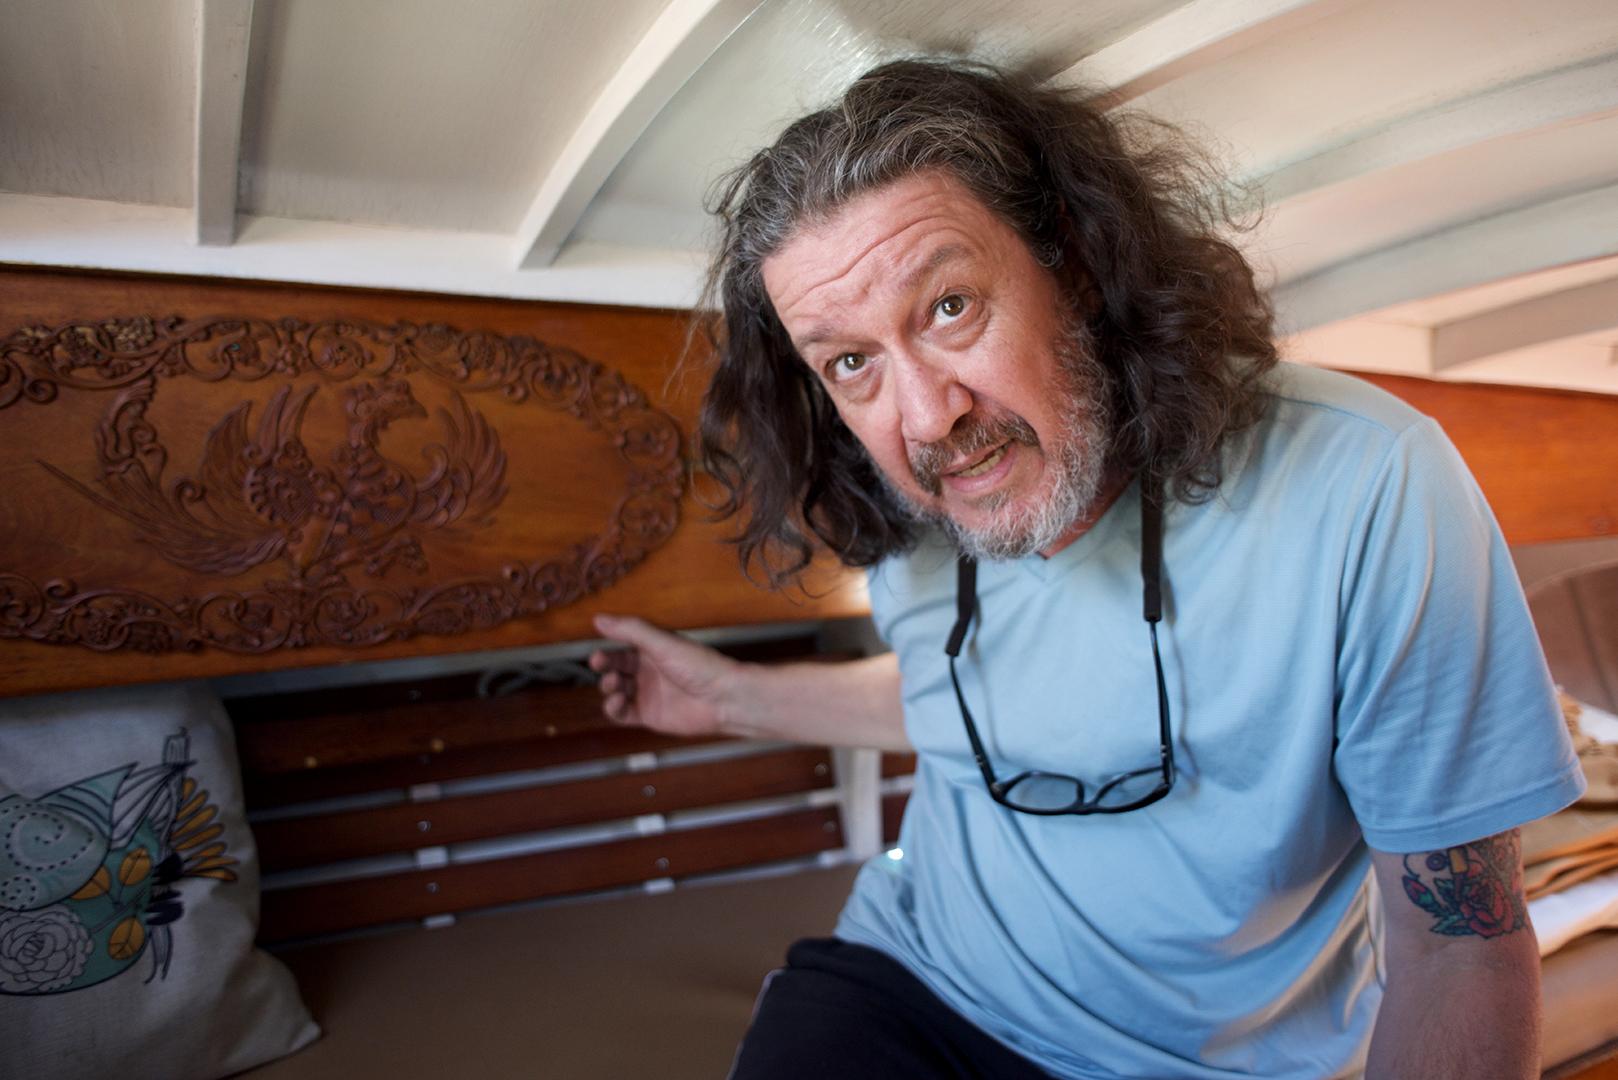 David Perry aboard his vintage sailboat. (Mike Blanchard photo)